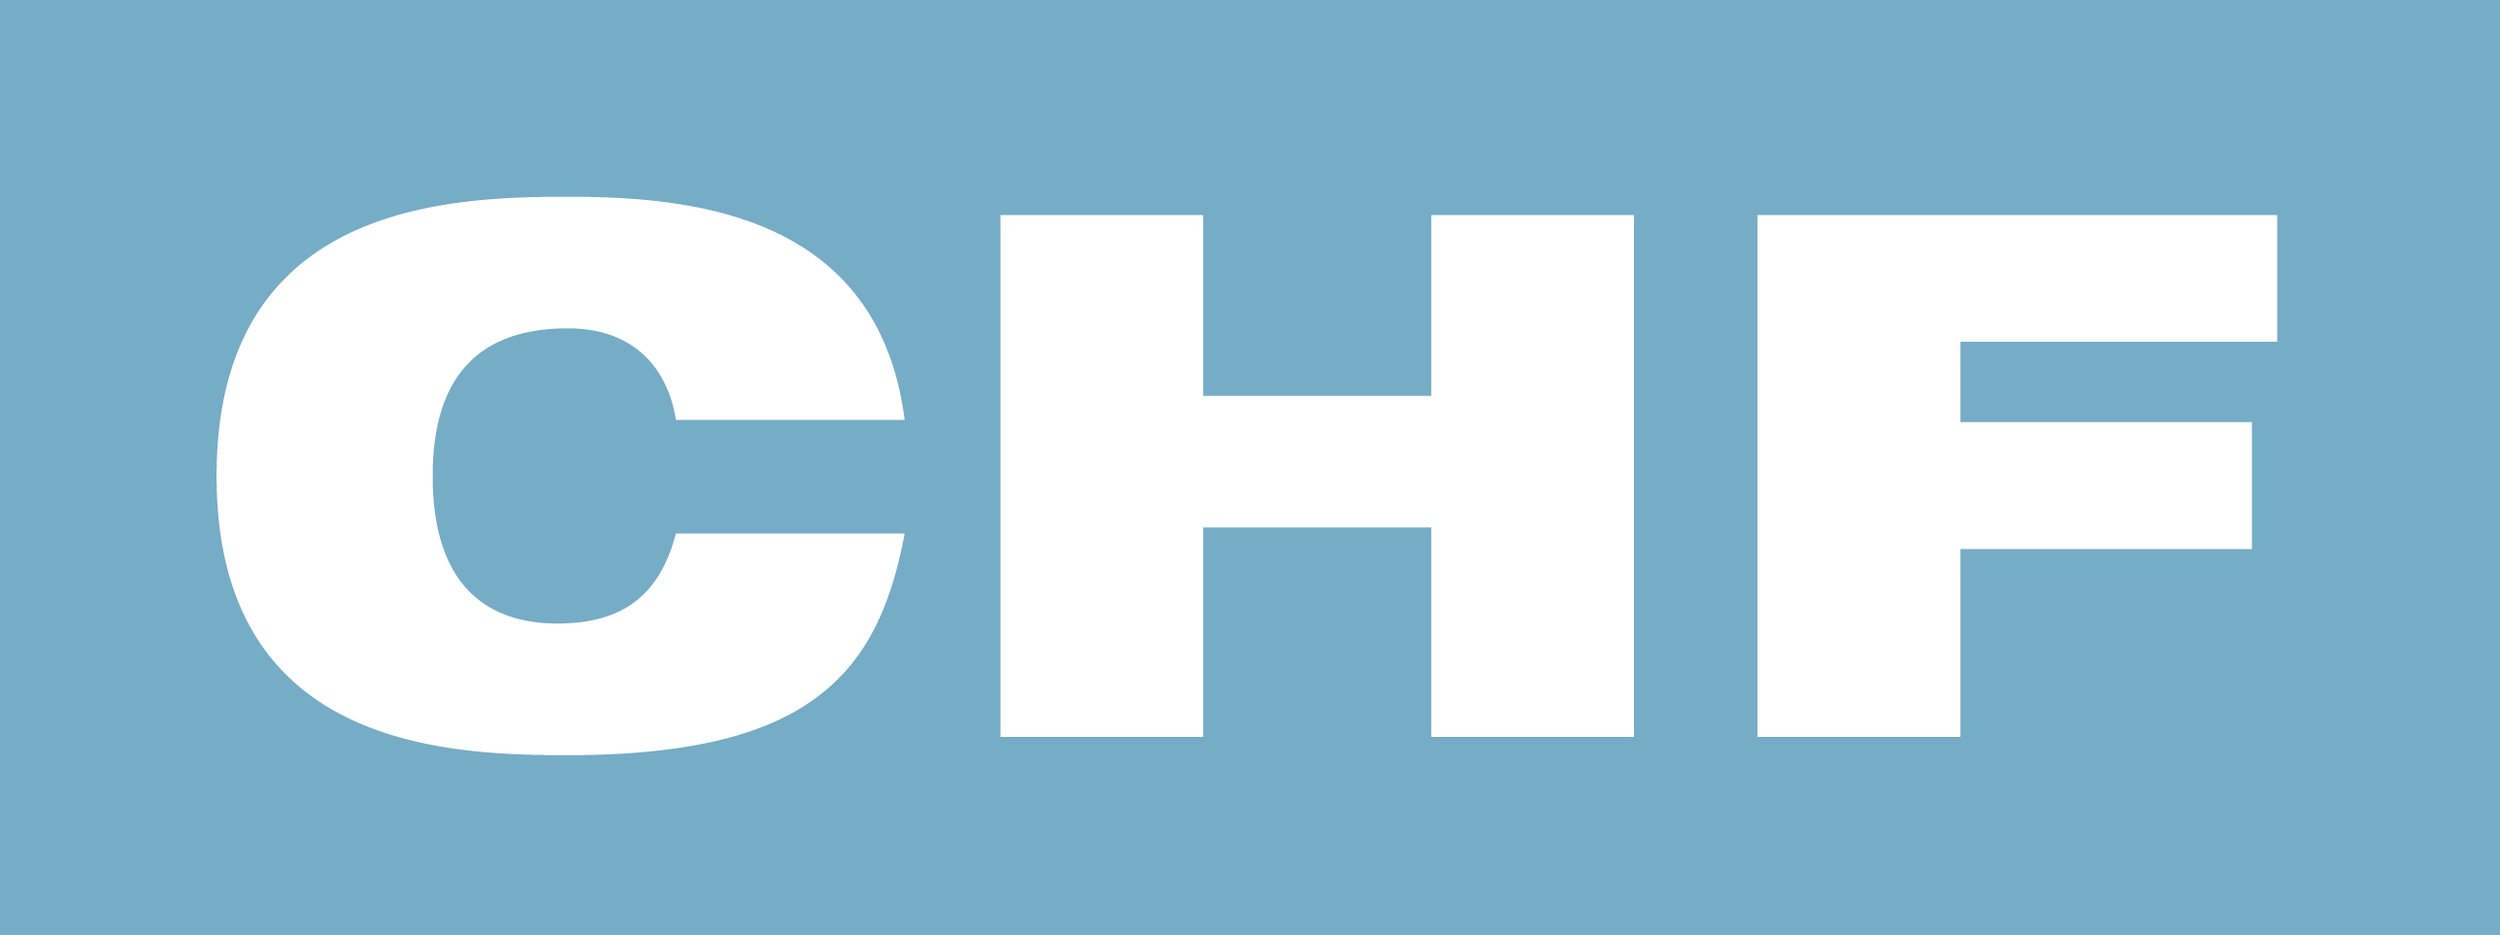 CHF_LOGO-01.jpg